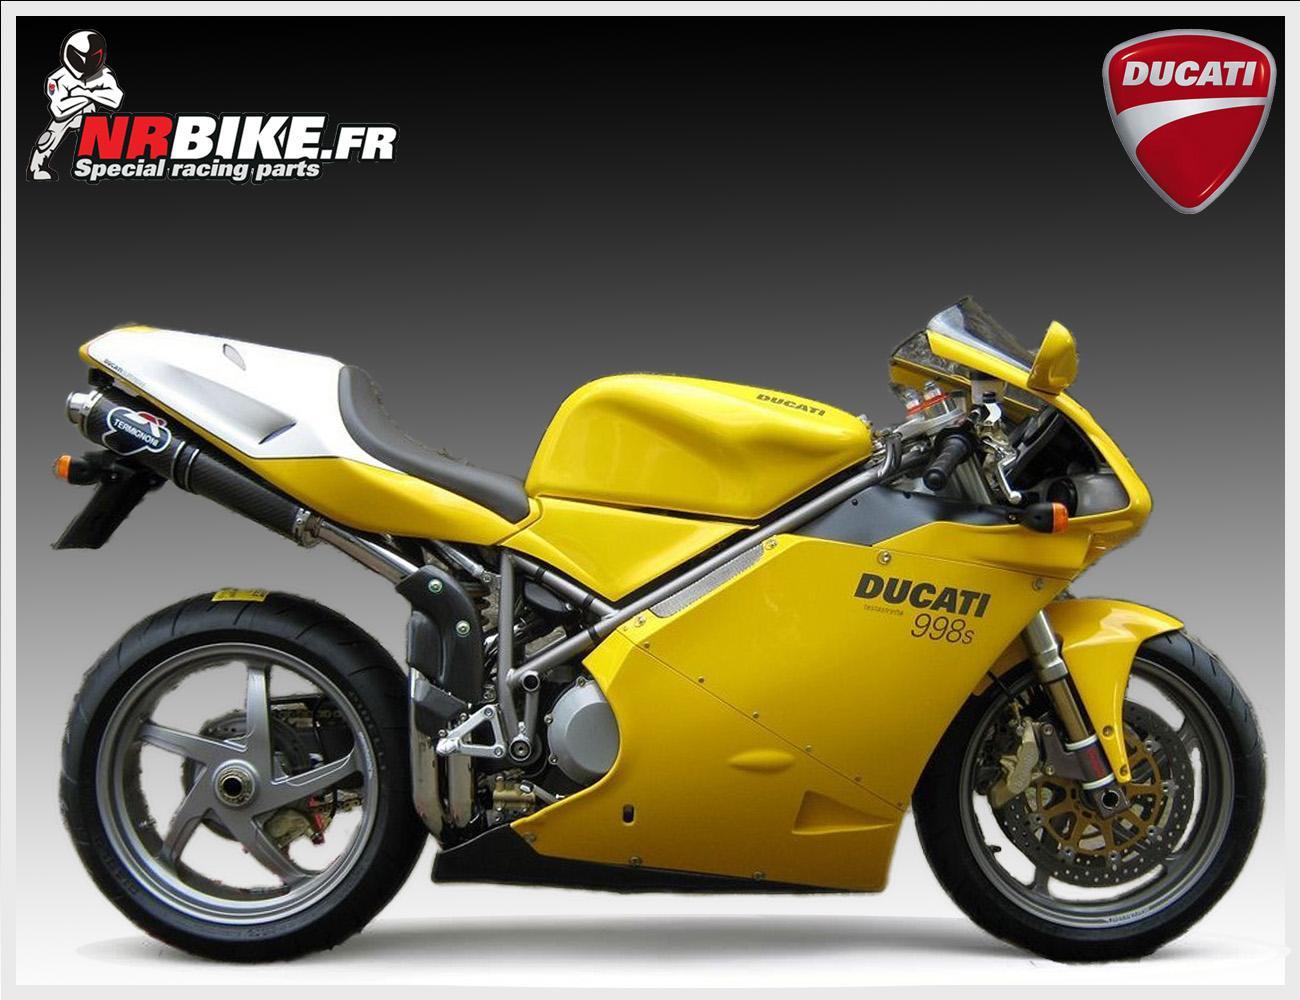 SBK 998 / S / R